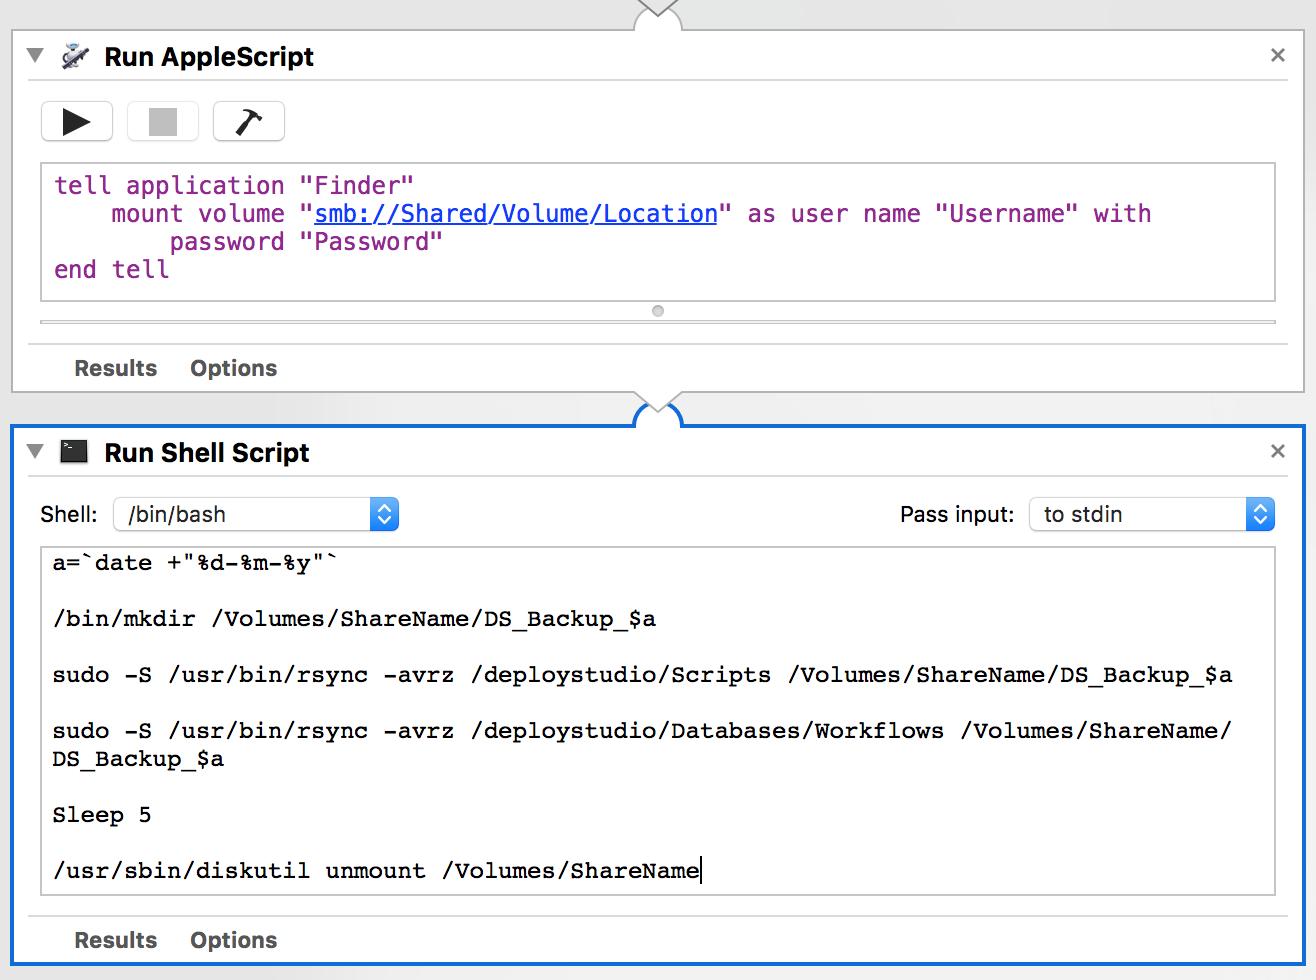 Schedule Backup of DeployStudio Custom Scripts and Workflows